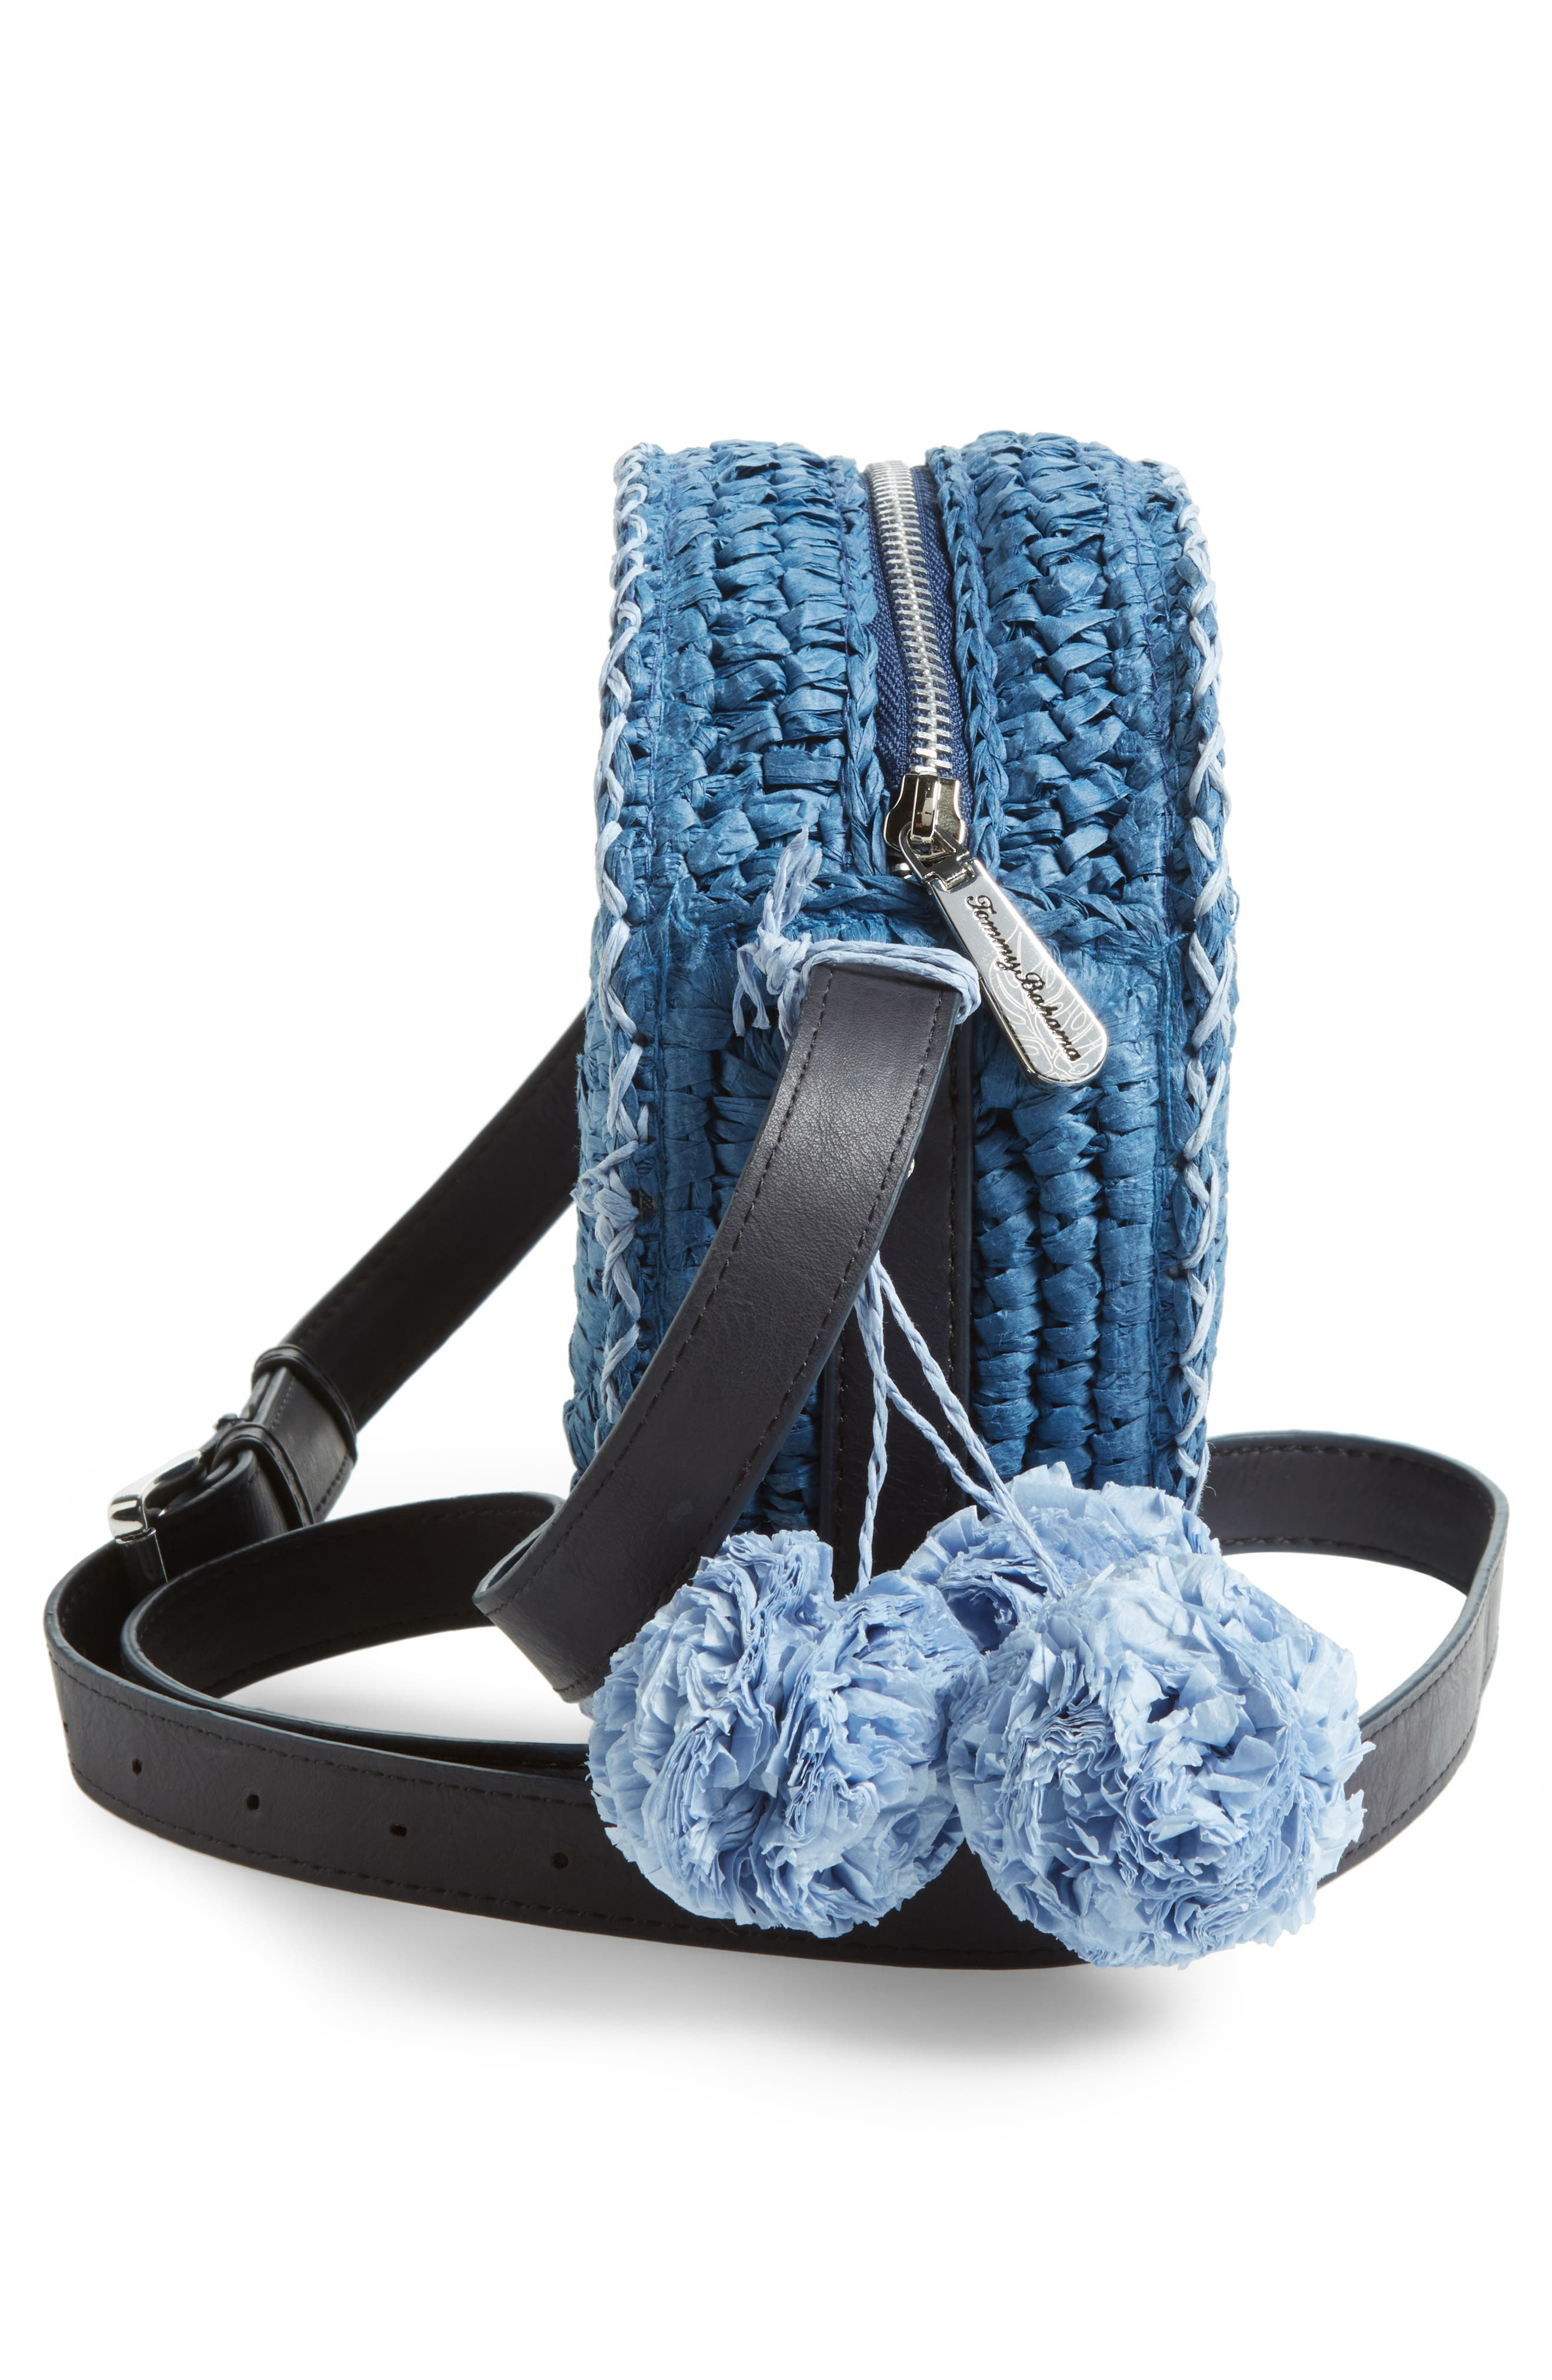 Pirro Woven Straw Crossbody Bag,                             Alternate thumbnail 5, color,                             Navy